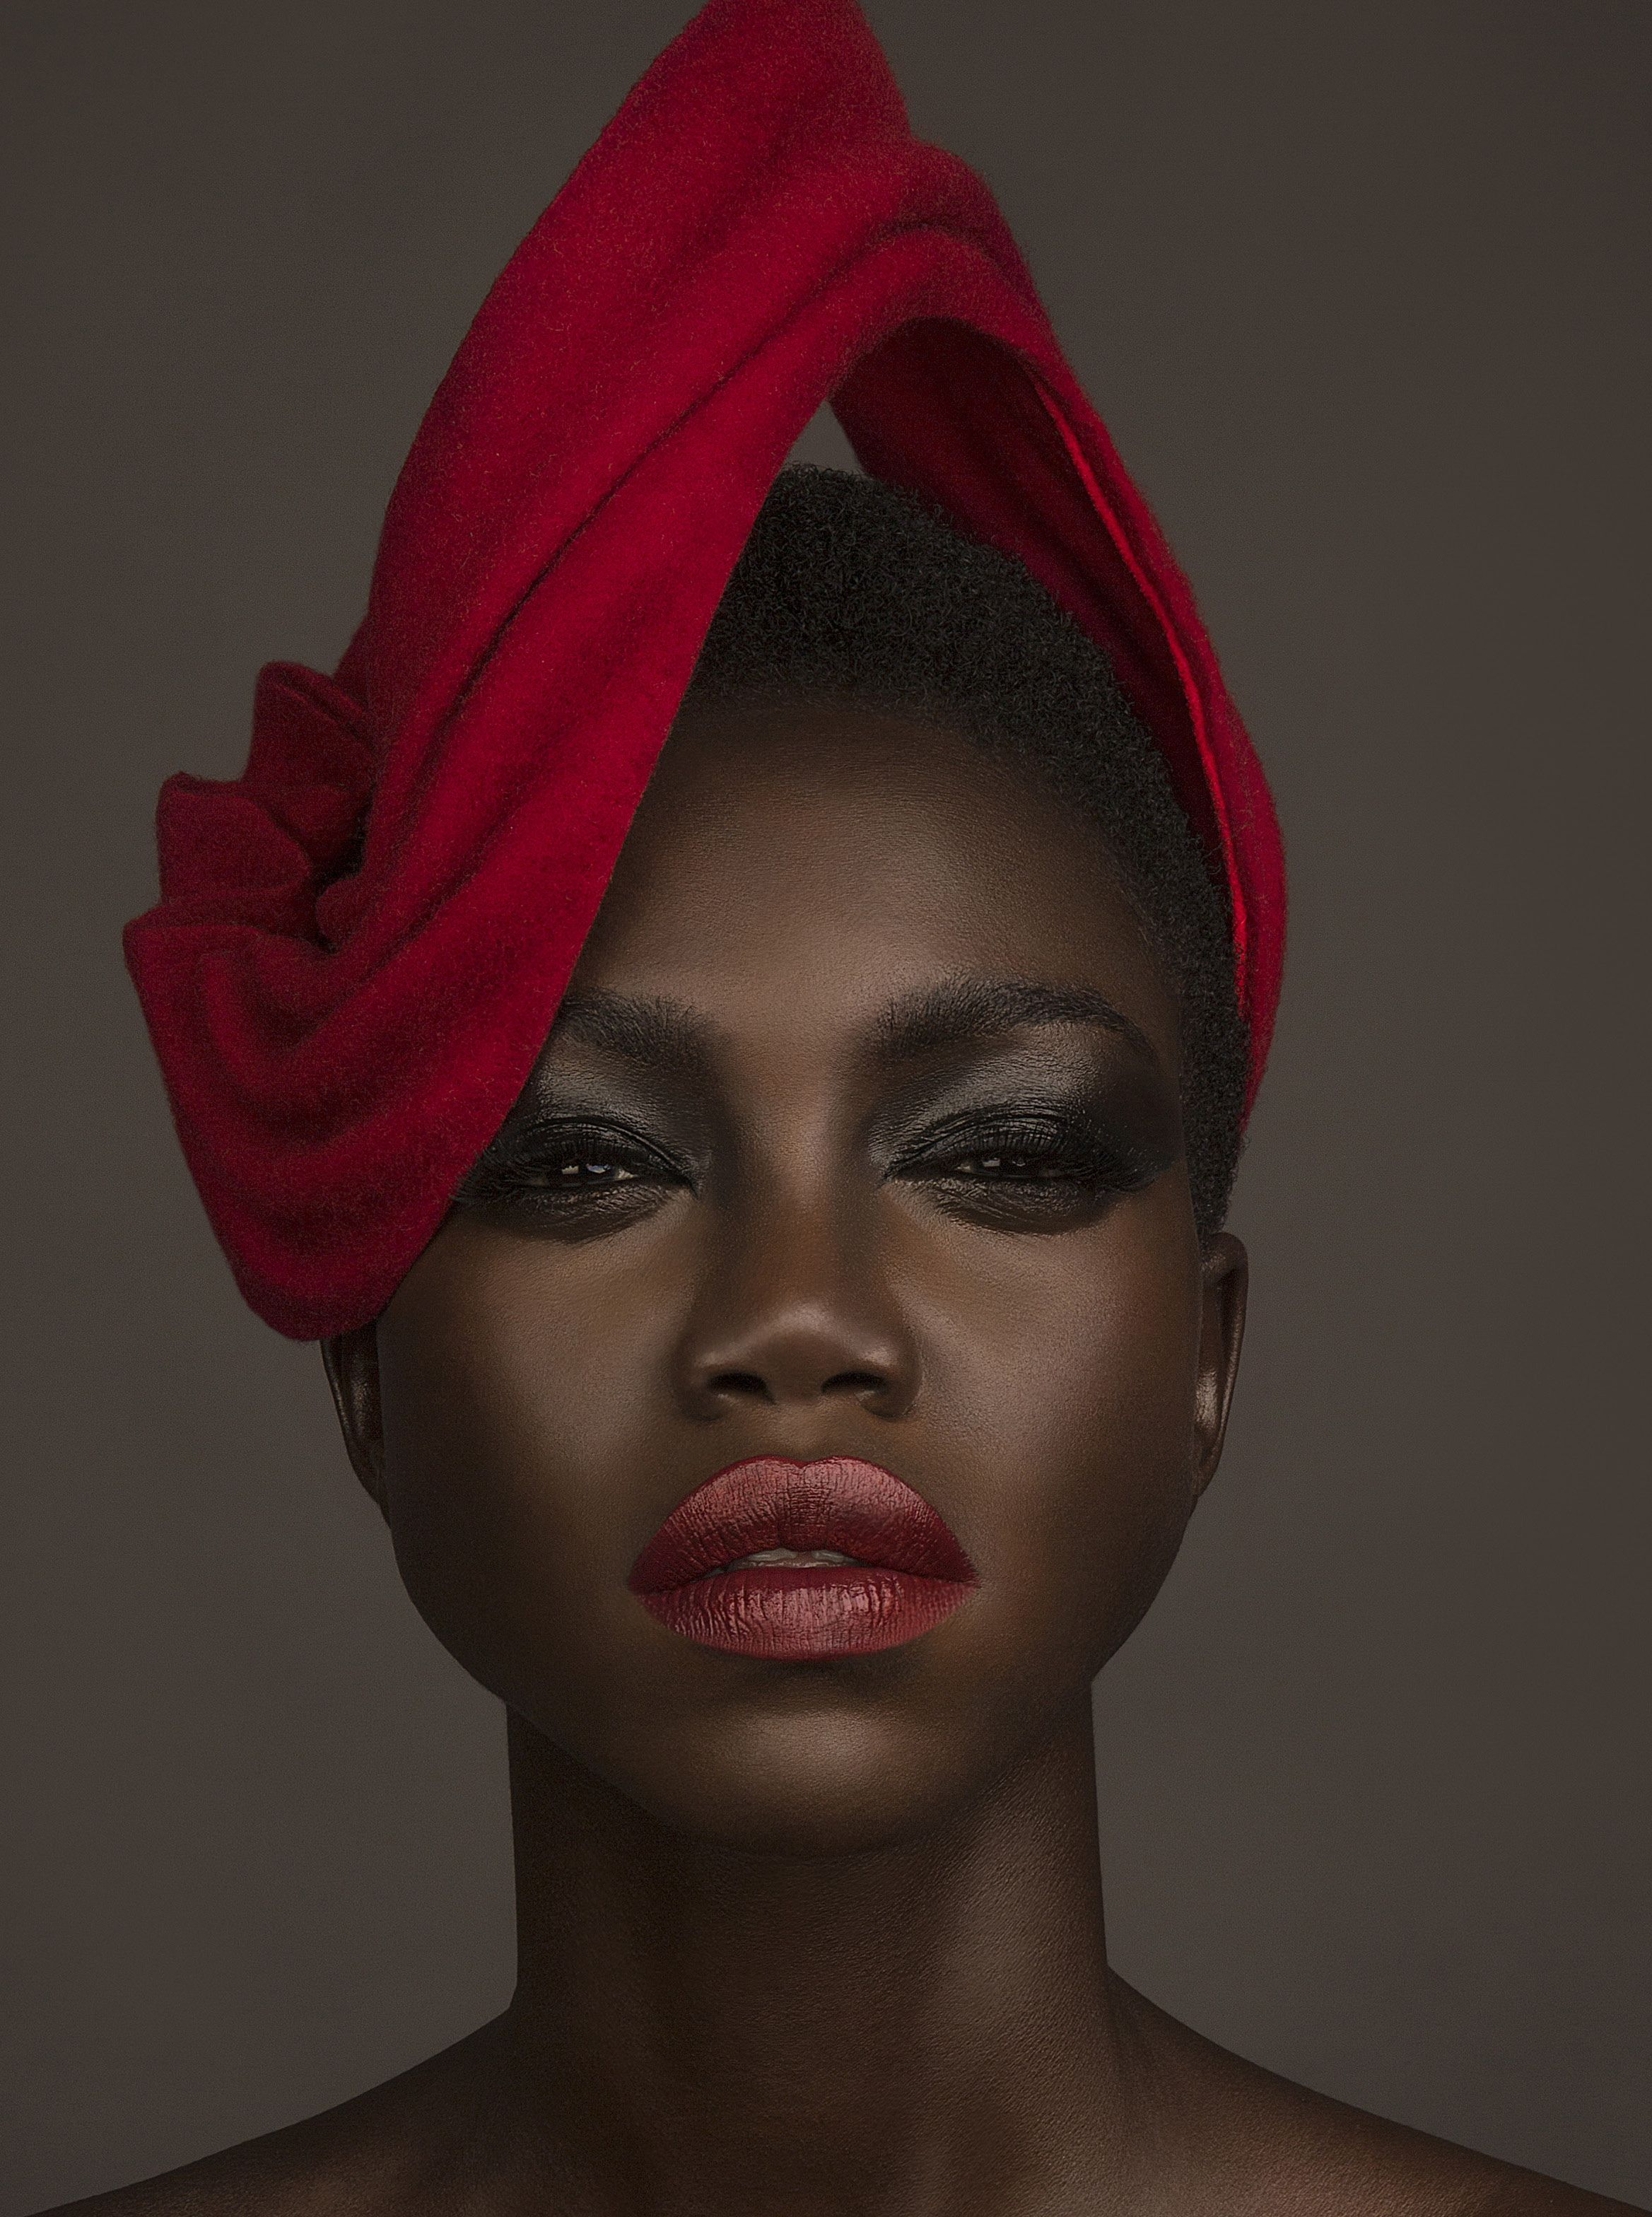 Fave Magazine   Photography by Mike Ruiz  Headpieces by Penny Chu at www.chuchuny.com  Model Nyamouch Griwath   Makeup by Eliza Davila